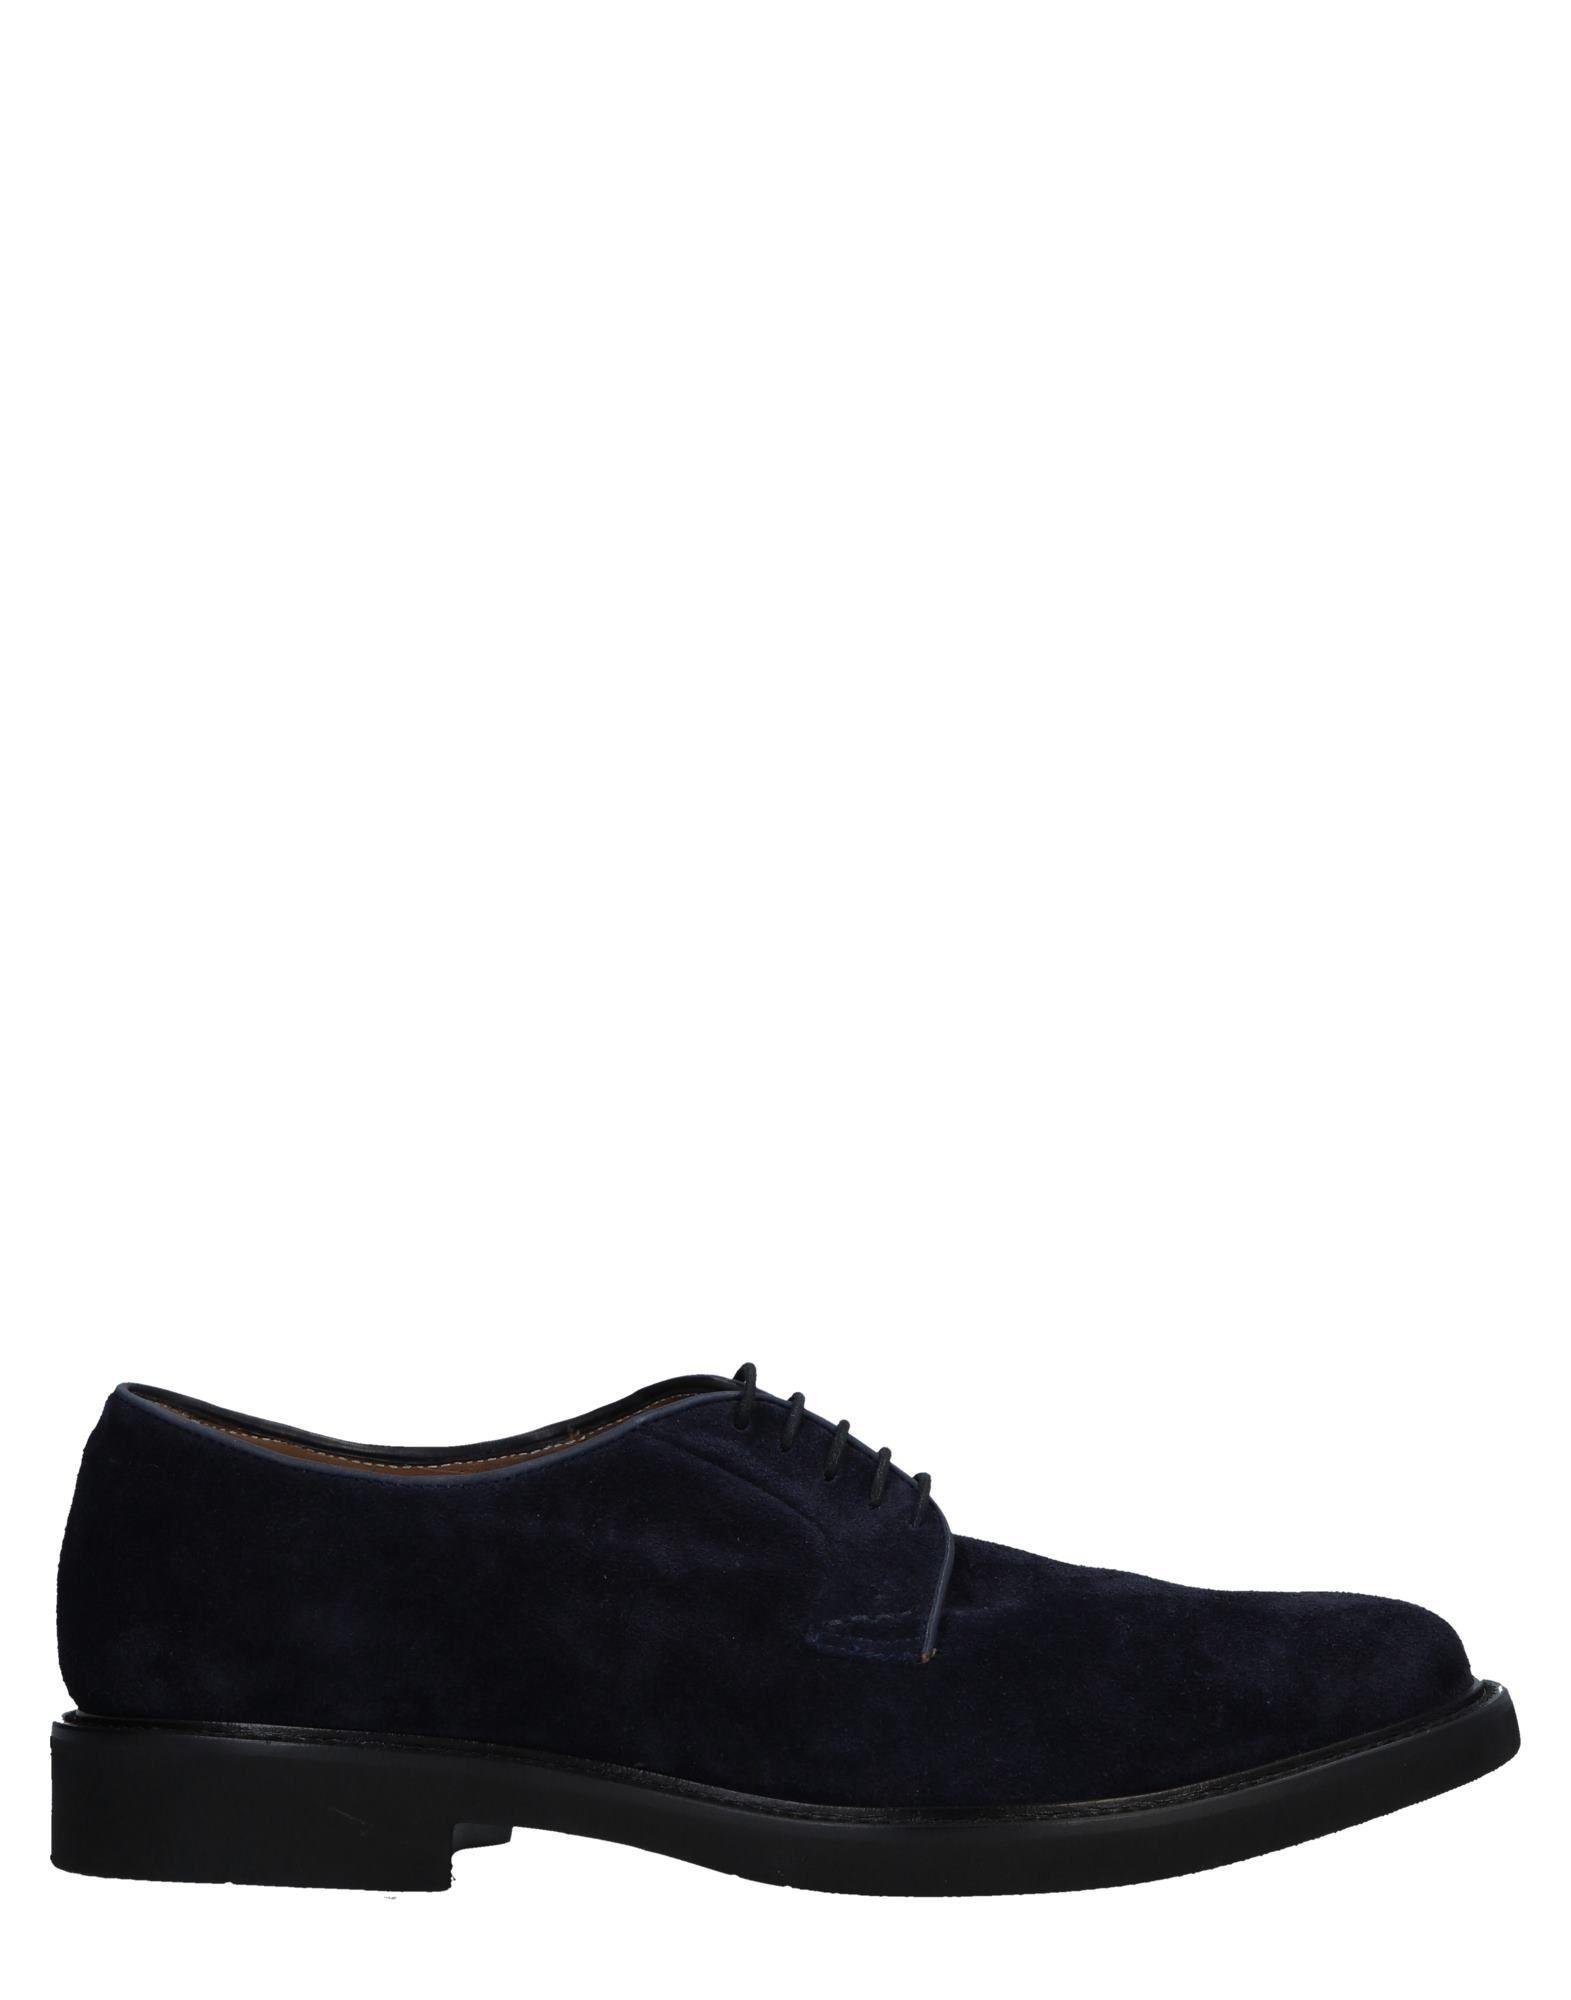 Фото - BRIGHTON Обувь на шнурках обувь на высокой платформе dkny